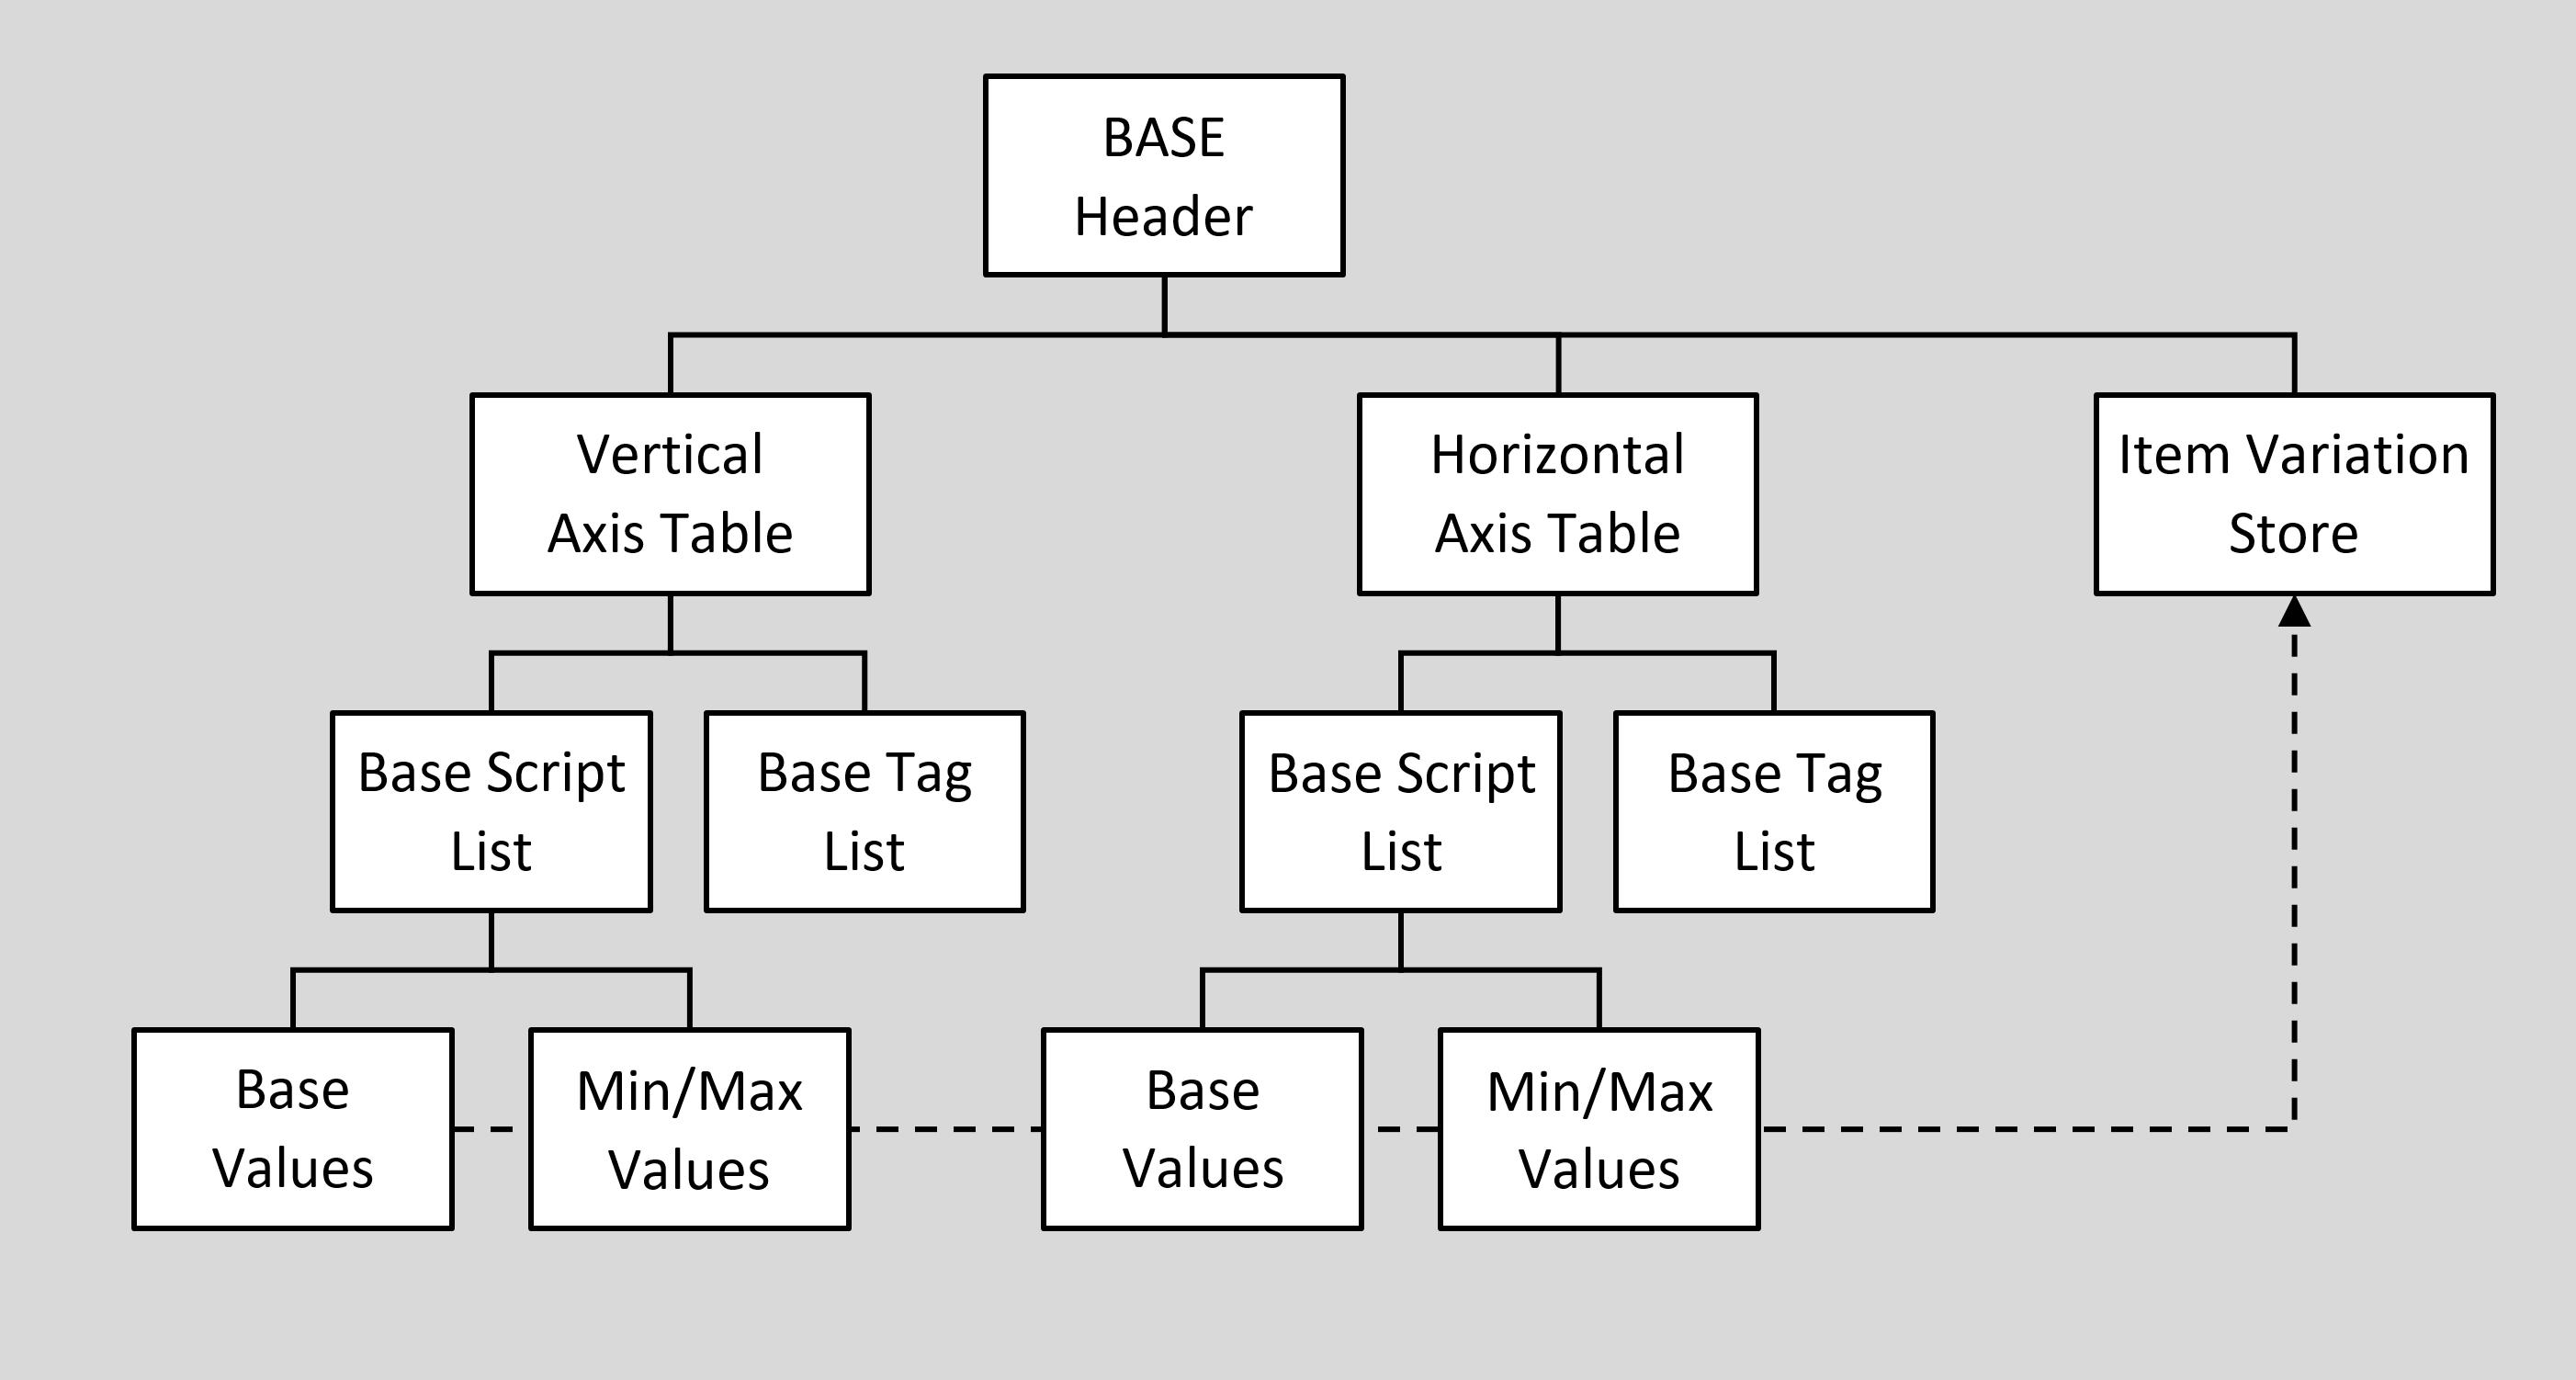 BASE - Baseline table - Typography | Microsoft Docs